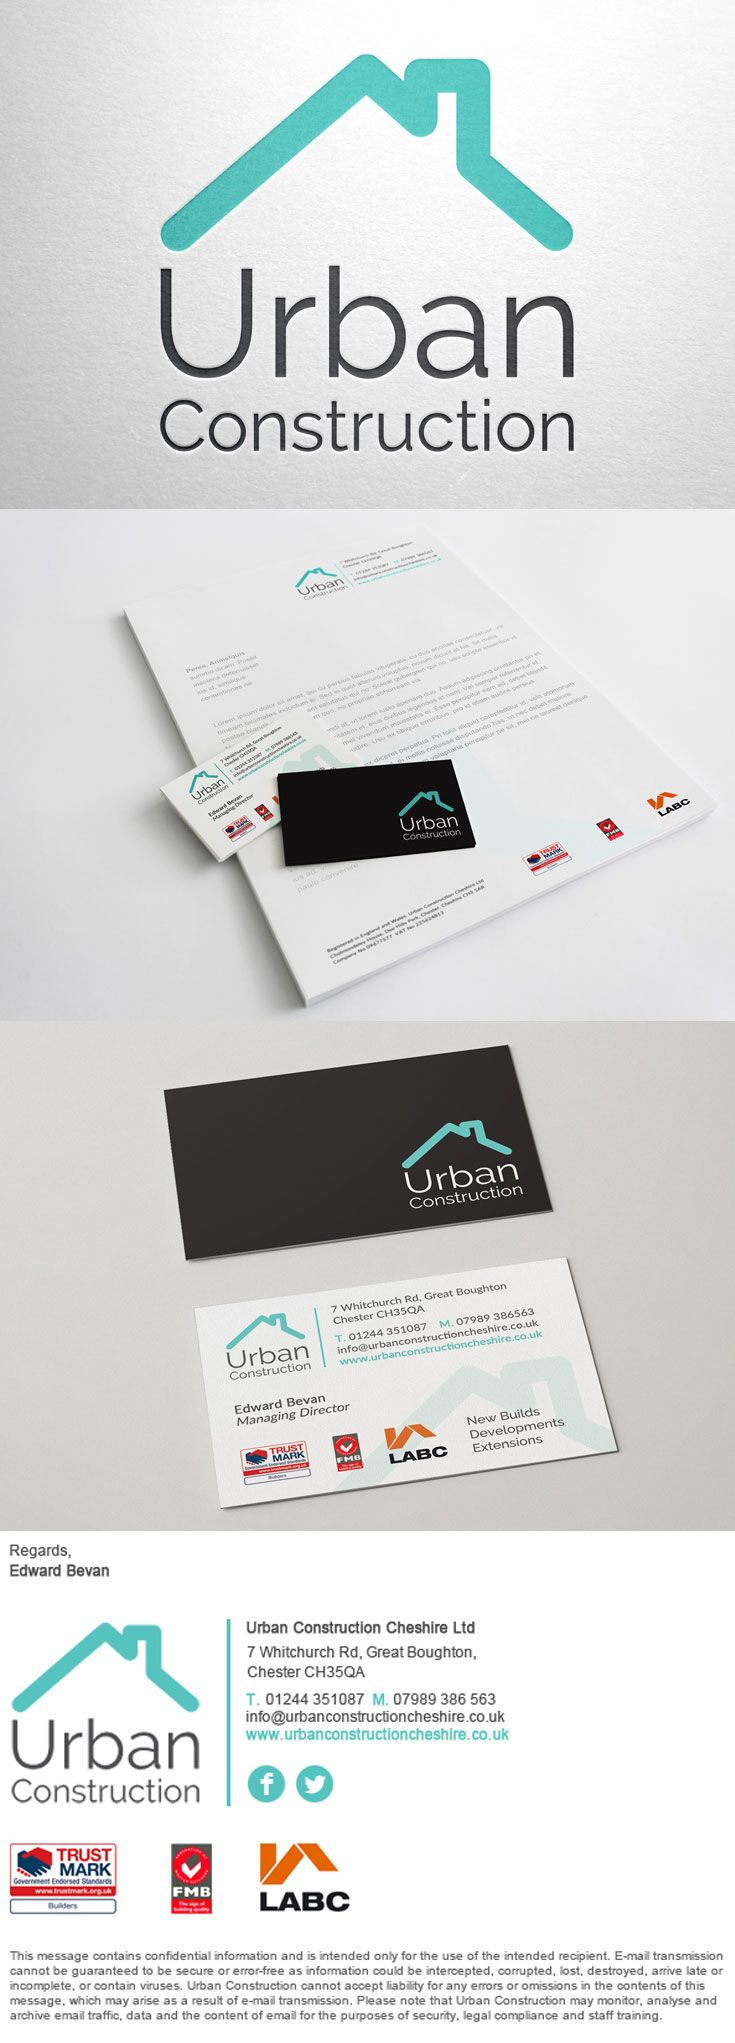 Construction logo stationery business card and e signature